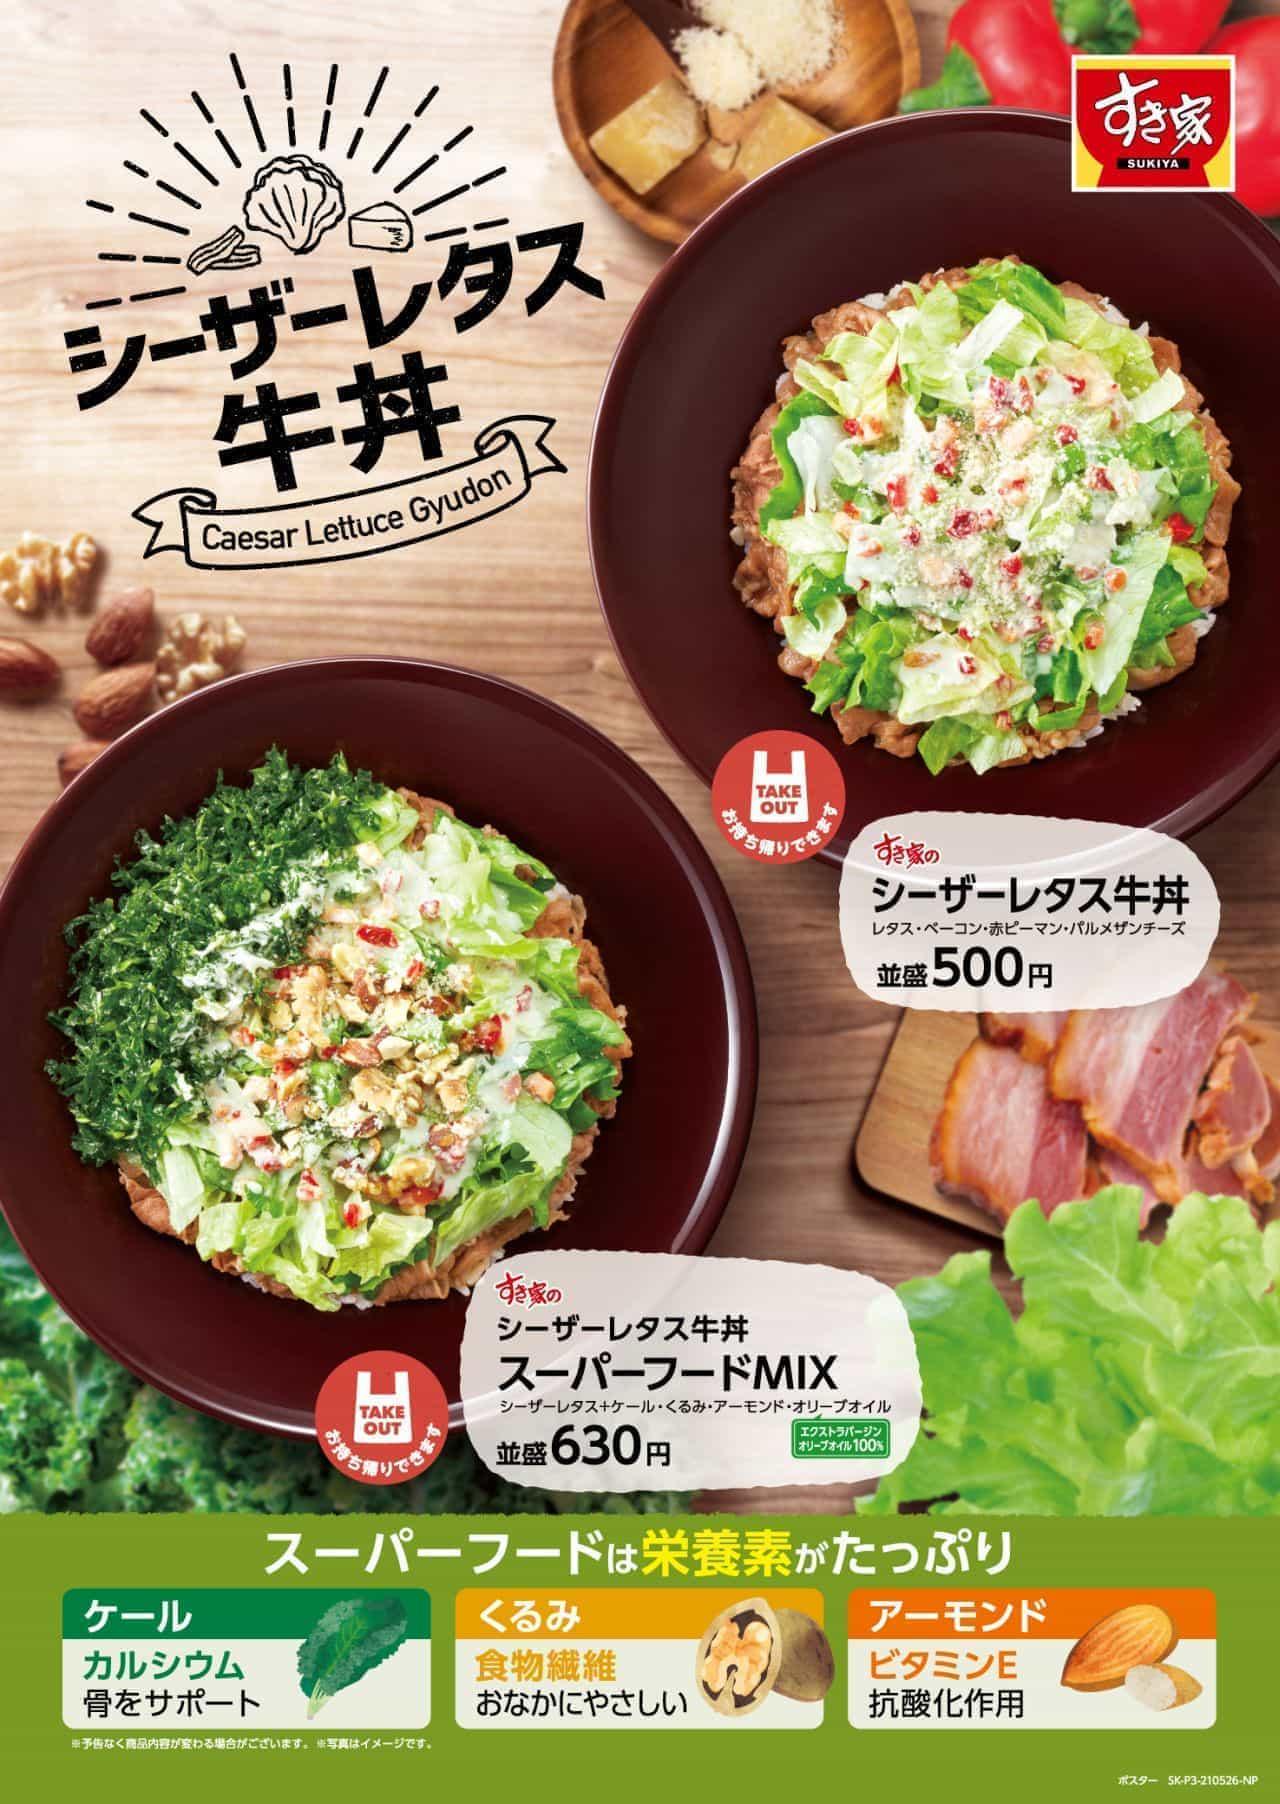 すき家「シーザーレタス牛丼 スーパーフードMIX」「シーザーレタス牛丼」